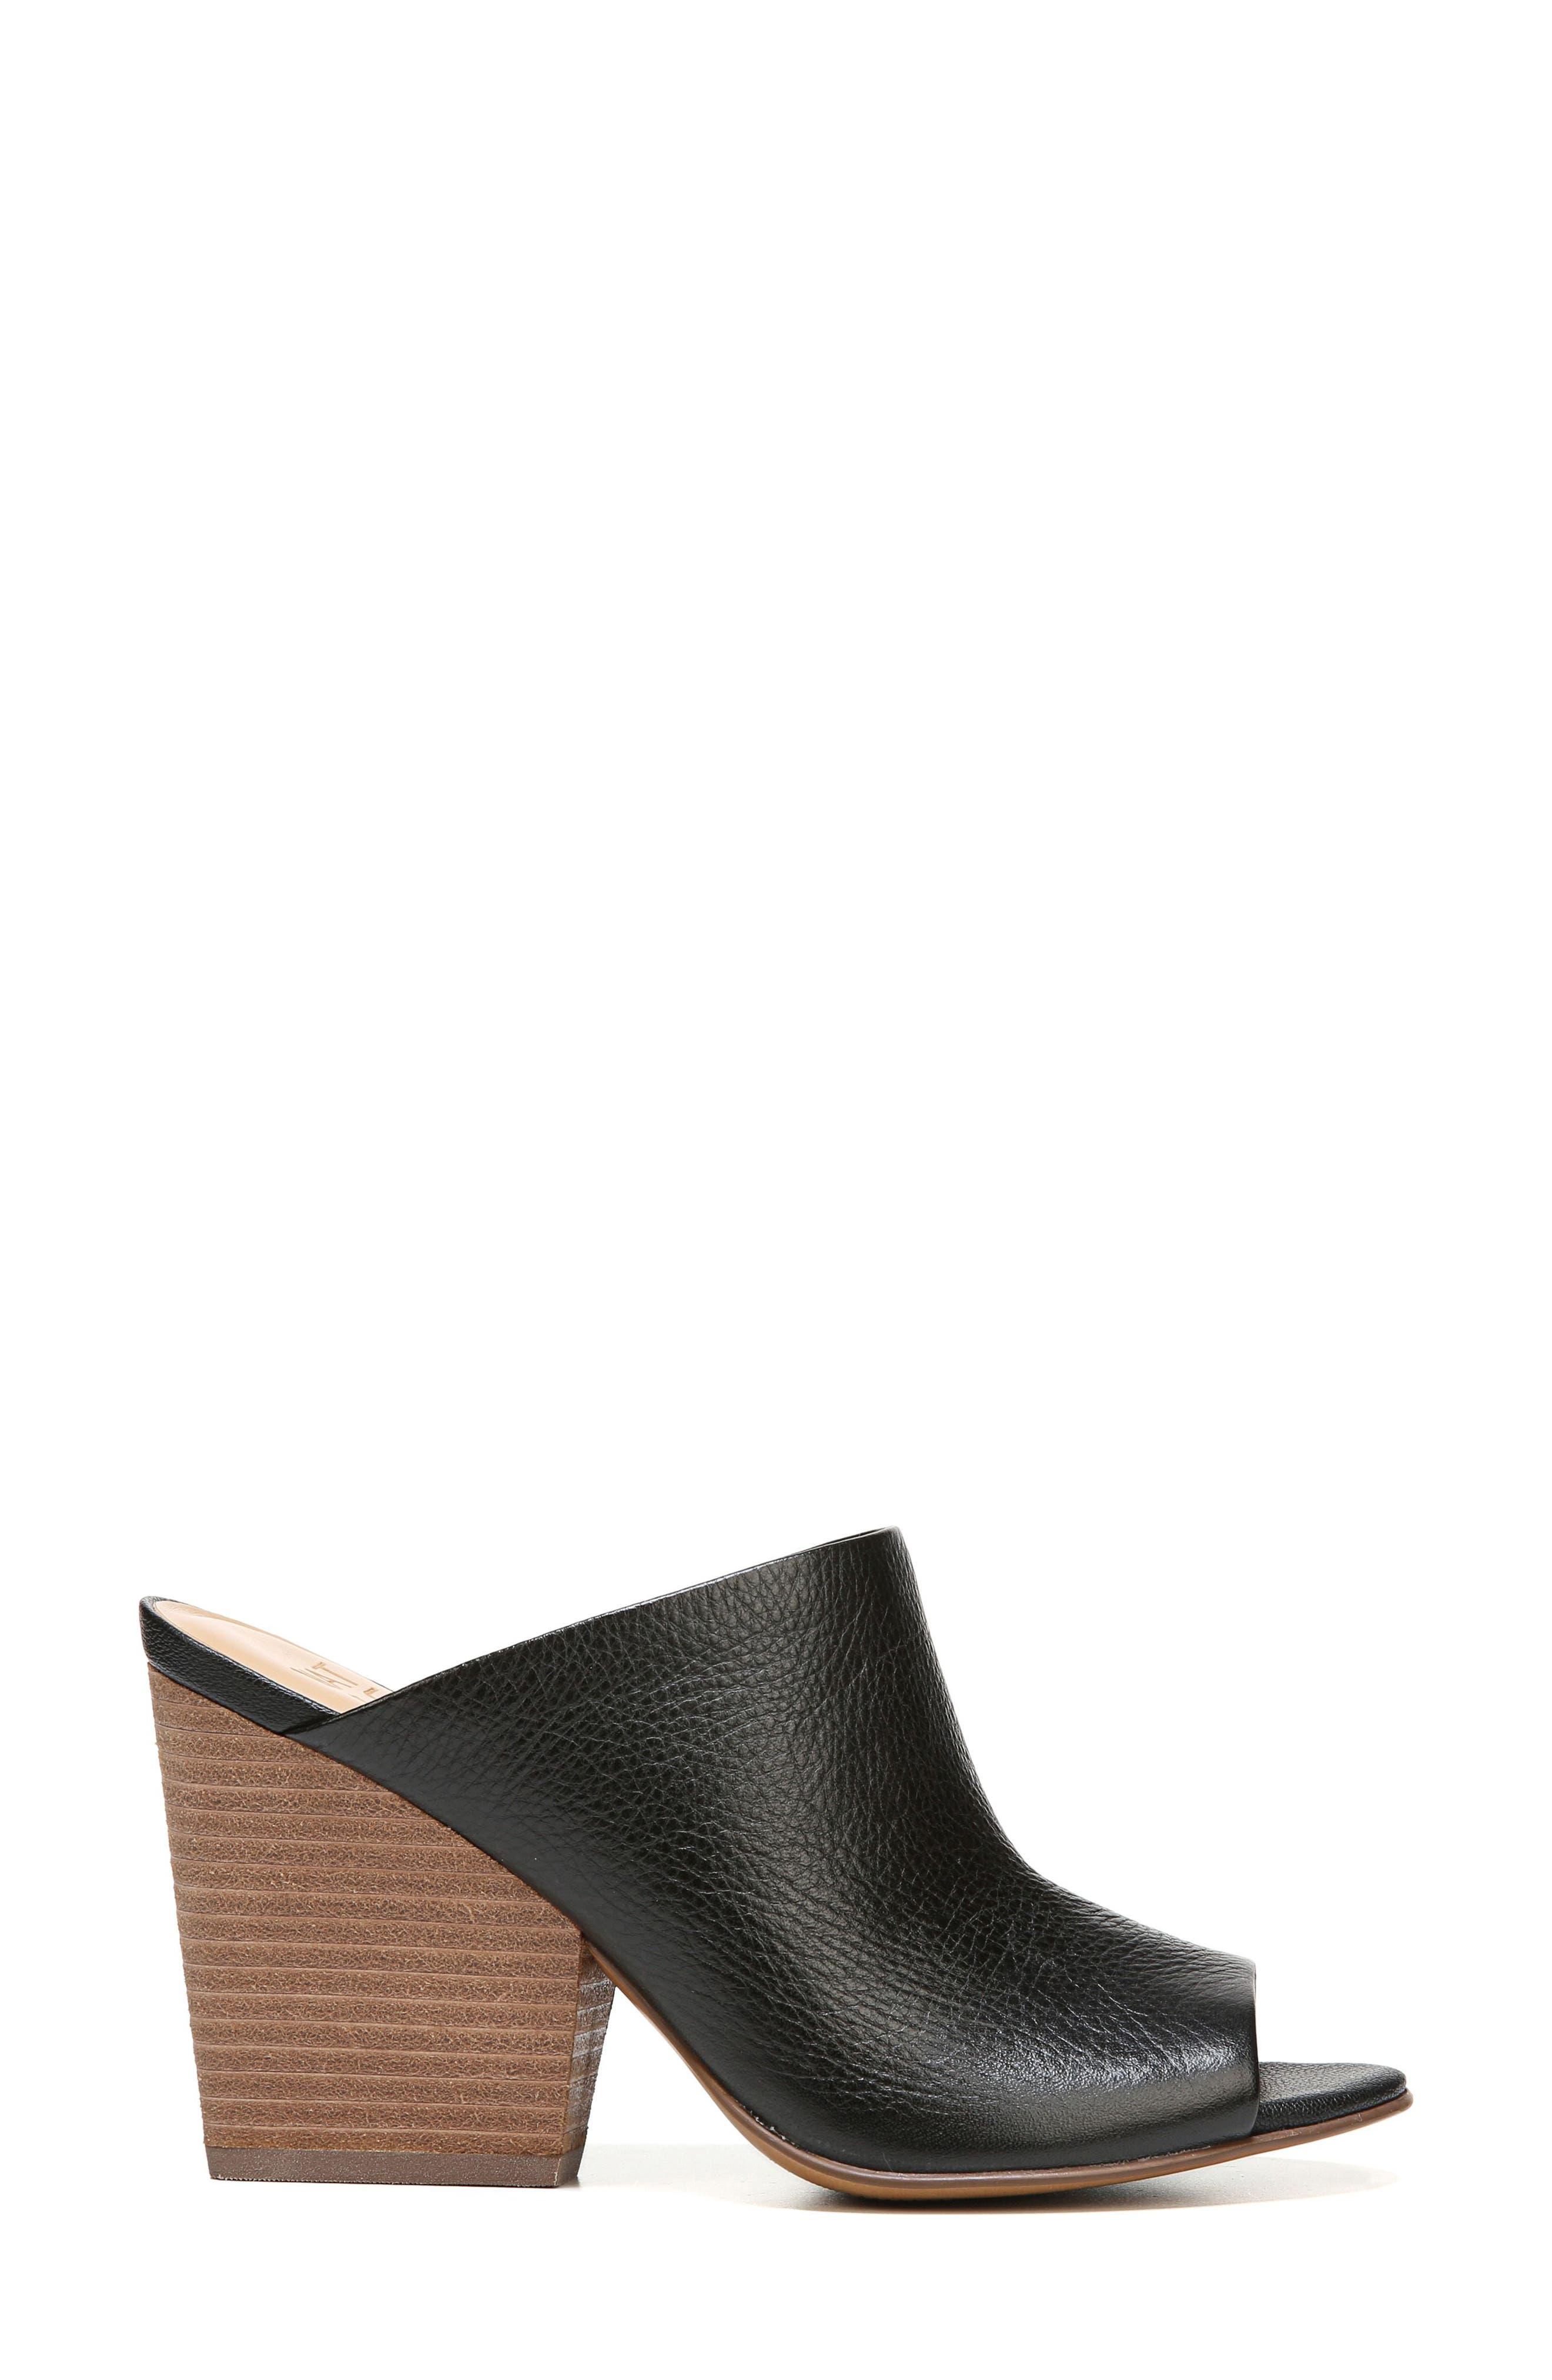 Sloan Sandal,                             Alternate thumbnail 3, color,                             Black Pebbled Leather